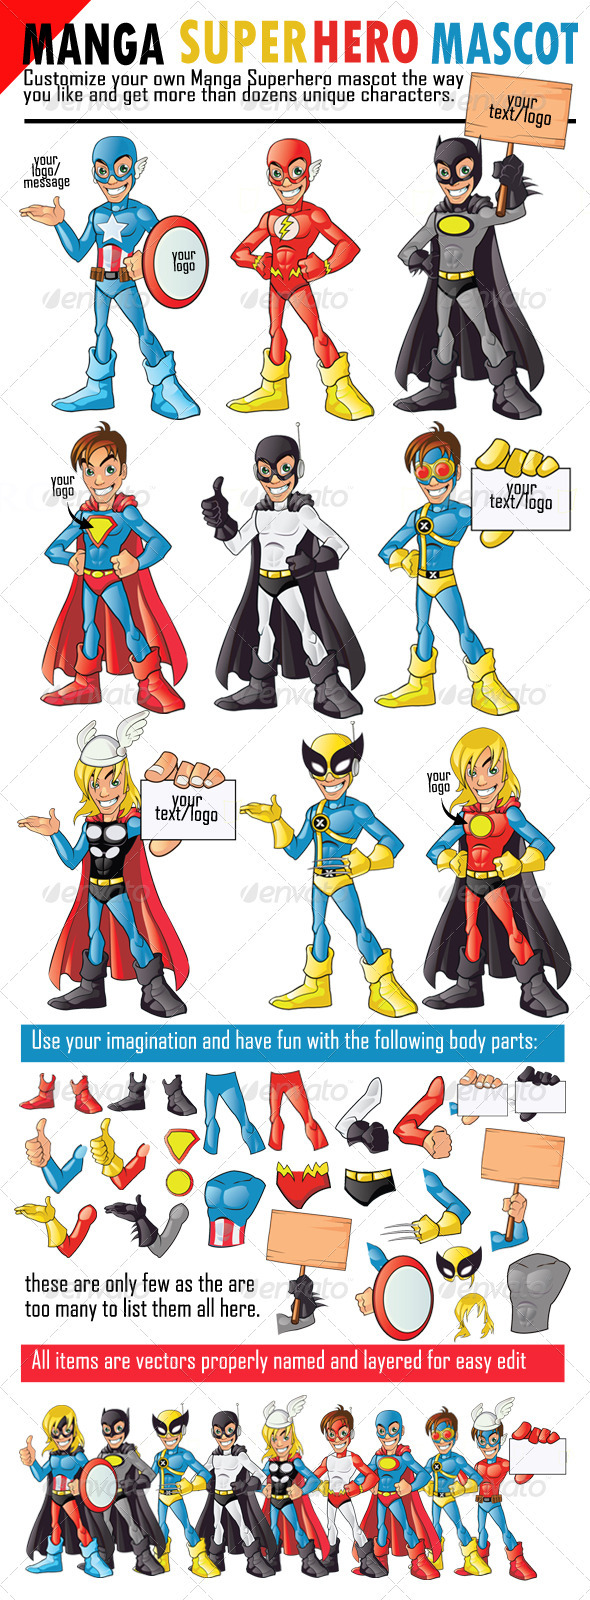 GraphicRiver Manga Superhero Mascot 1523540